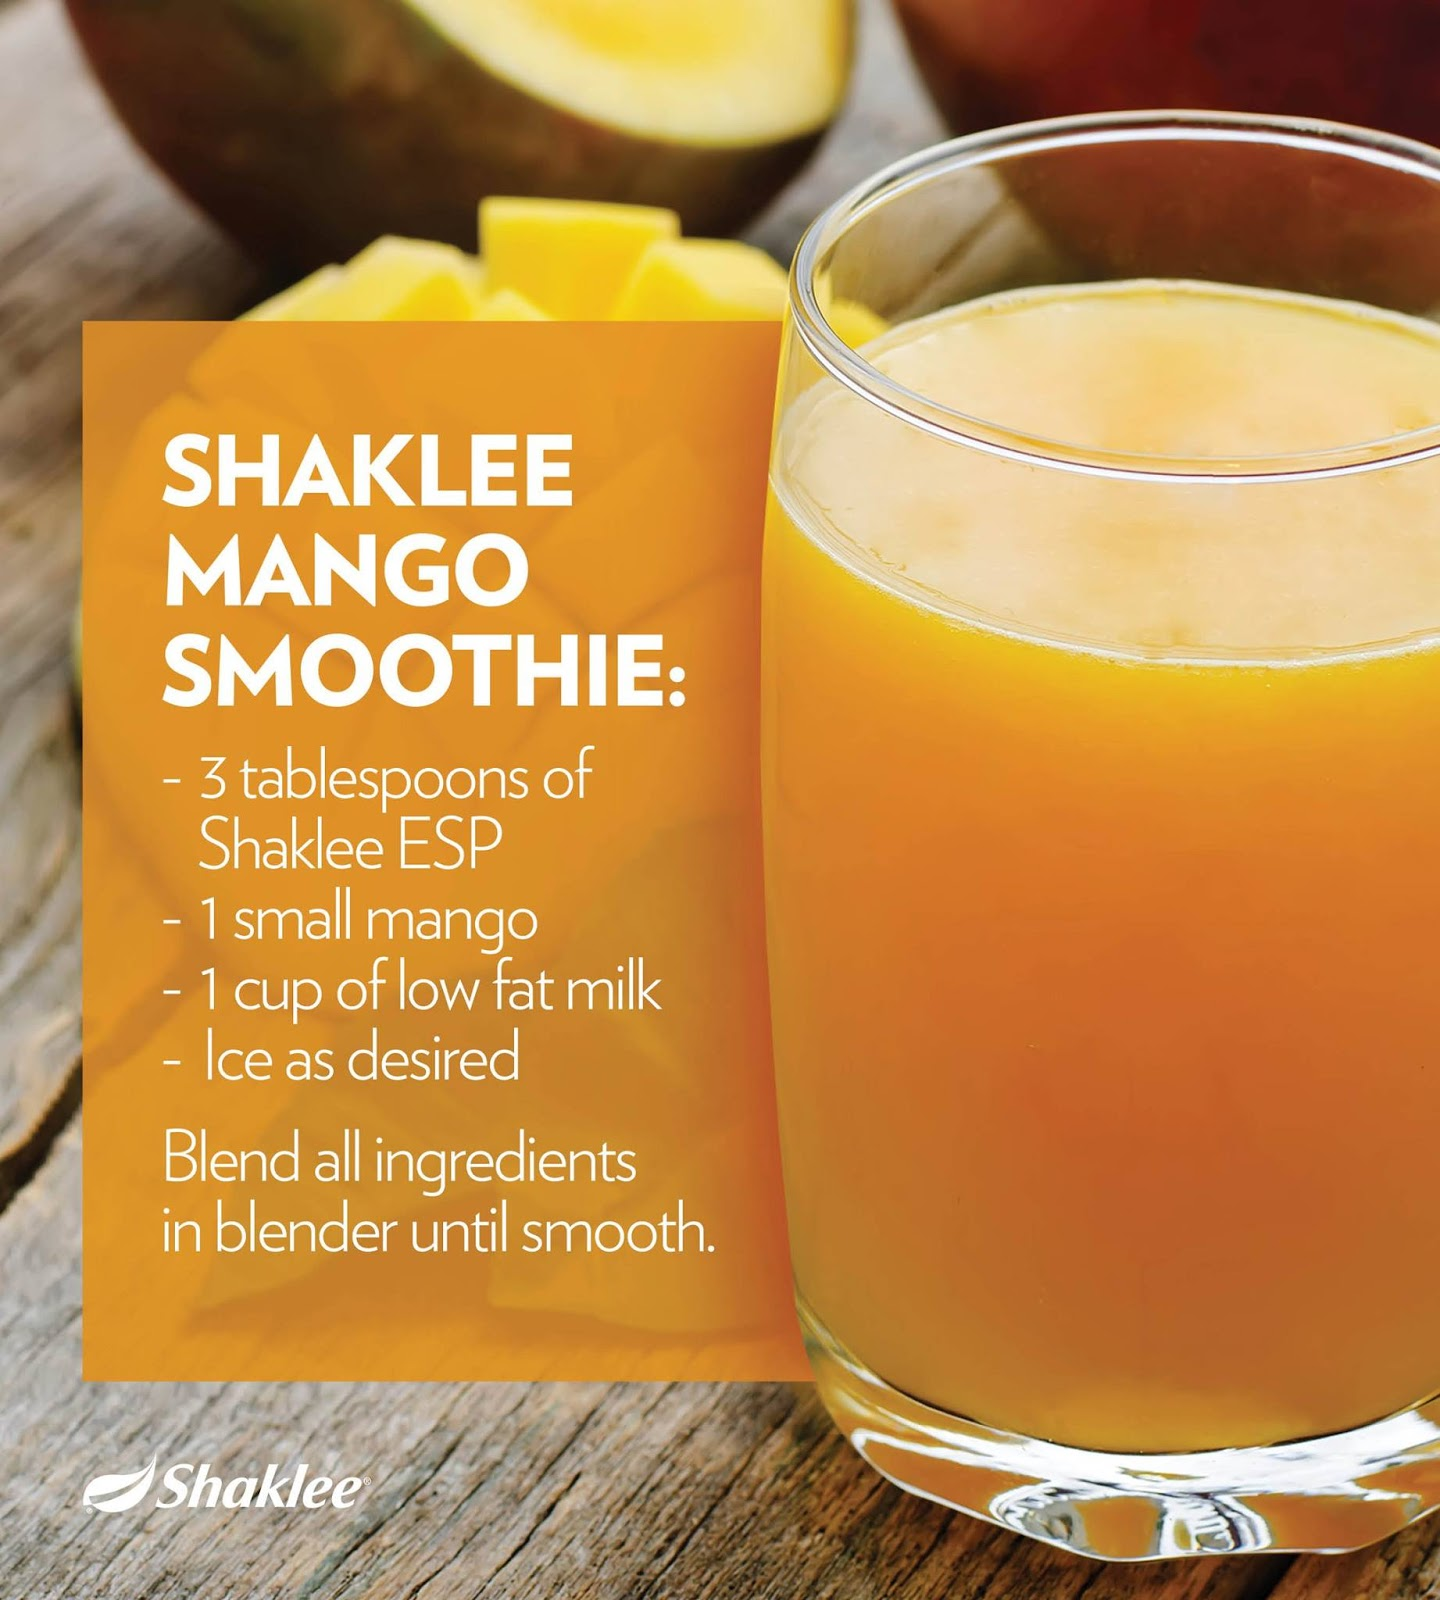 Hasil carian imej untuk PERFORMANCE DRINK SHAKLEE RECIPE